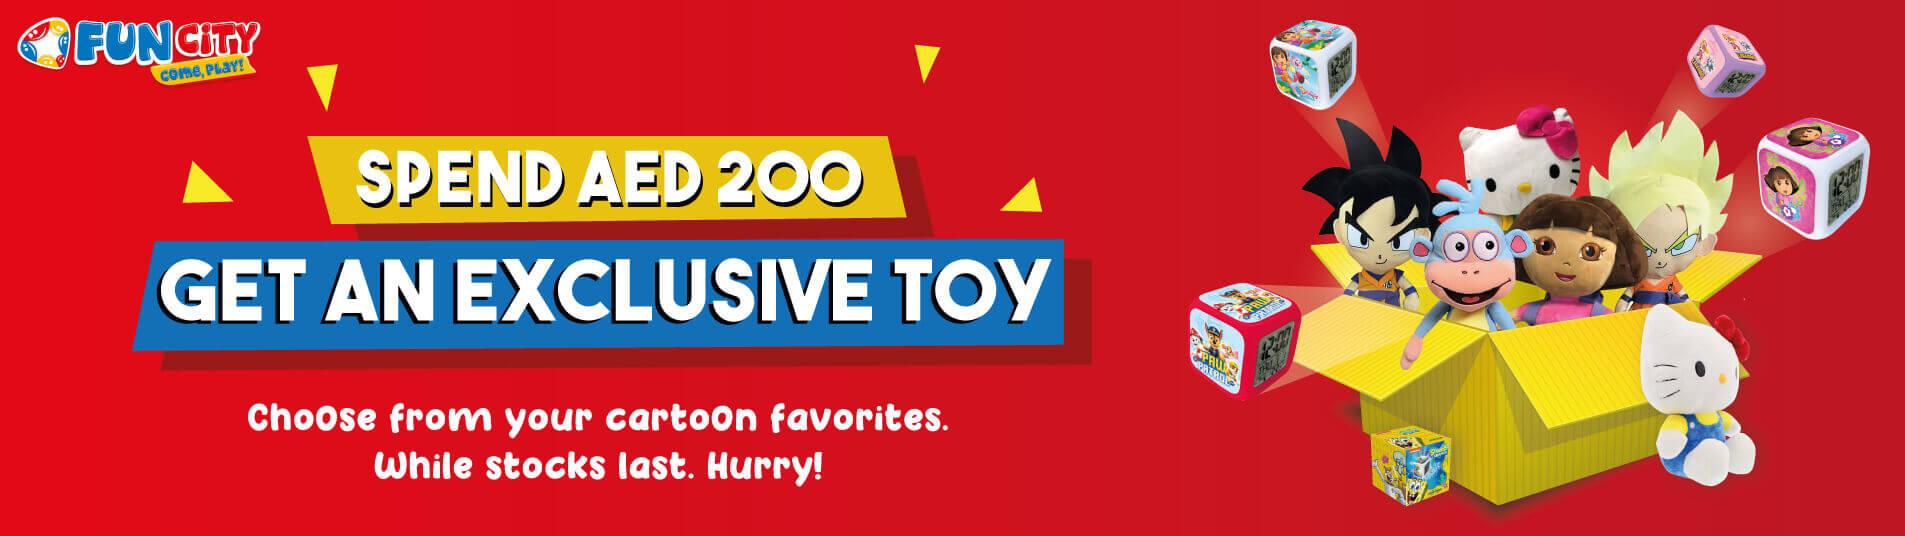 Toy promo from Fun City Ibn Battuta Mall